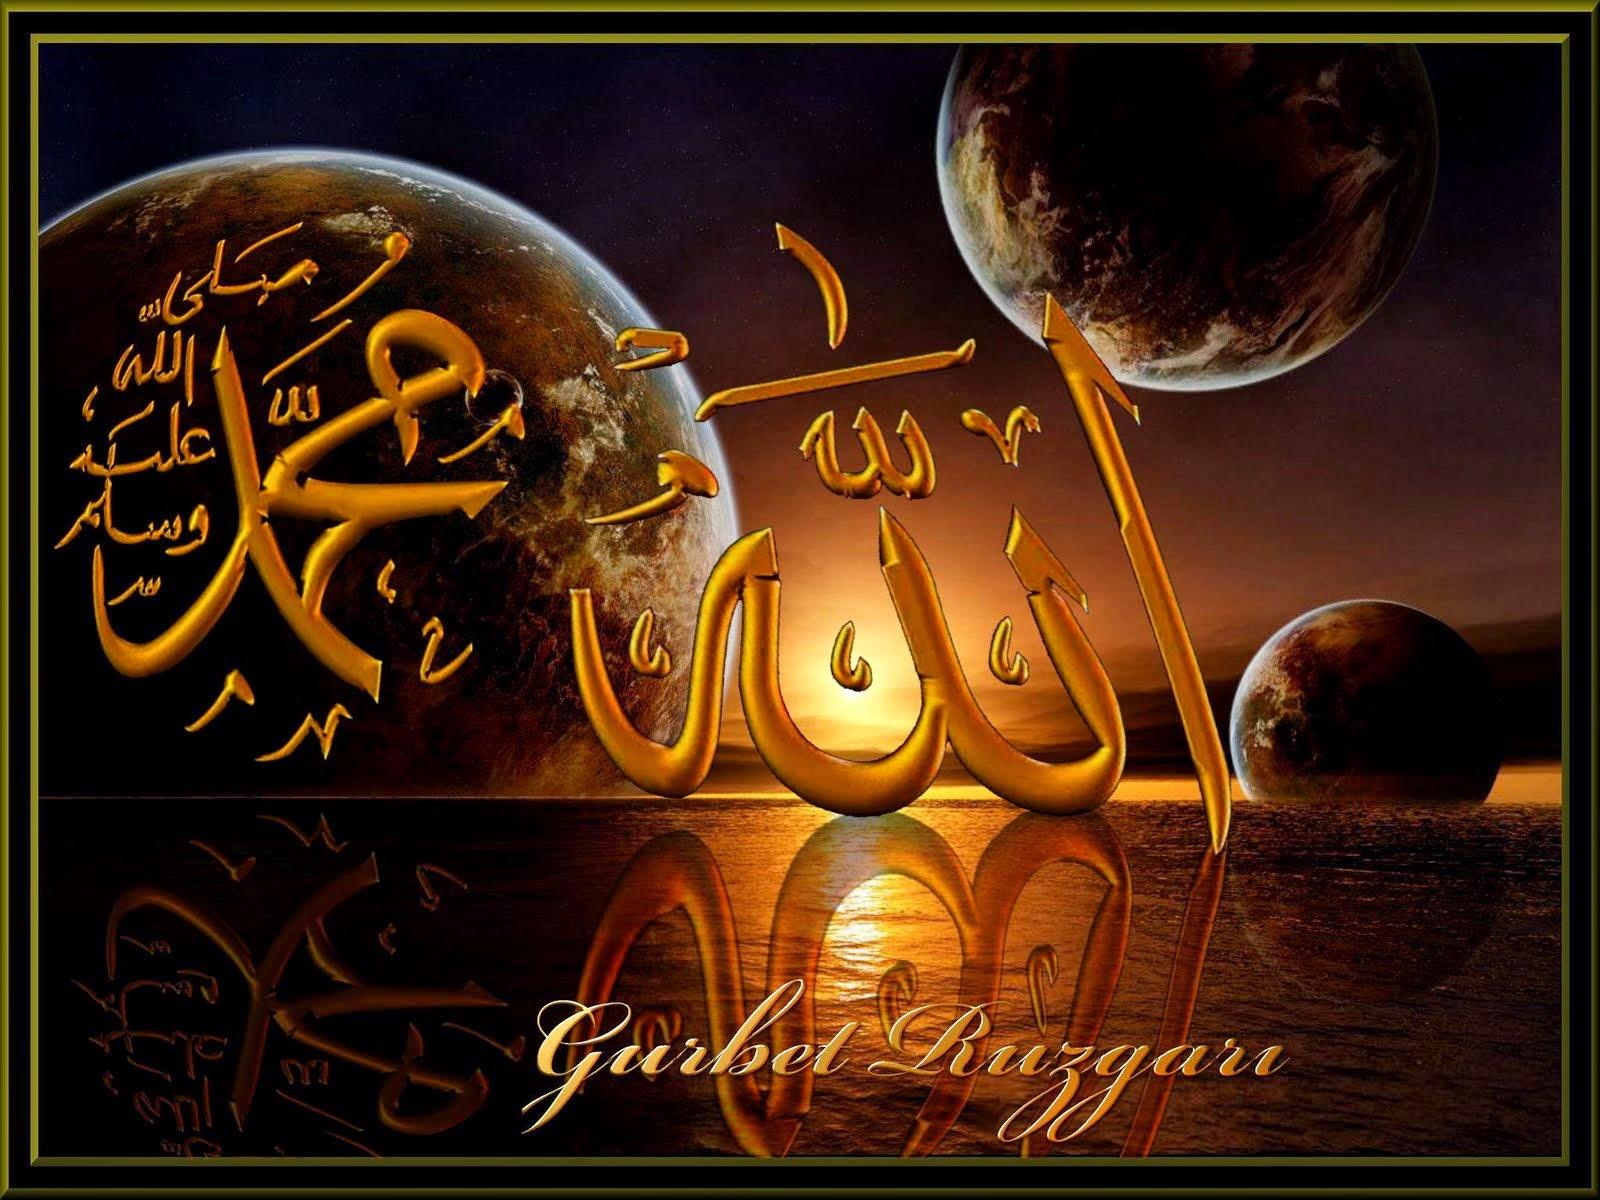 img]   Allah Muhammad Kaligrafi Wallpaper Hd   20x20 Wallpaper ...